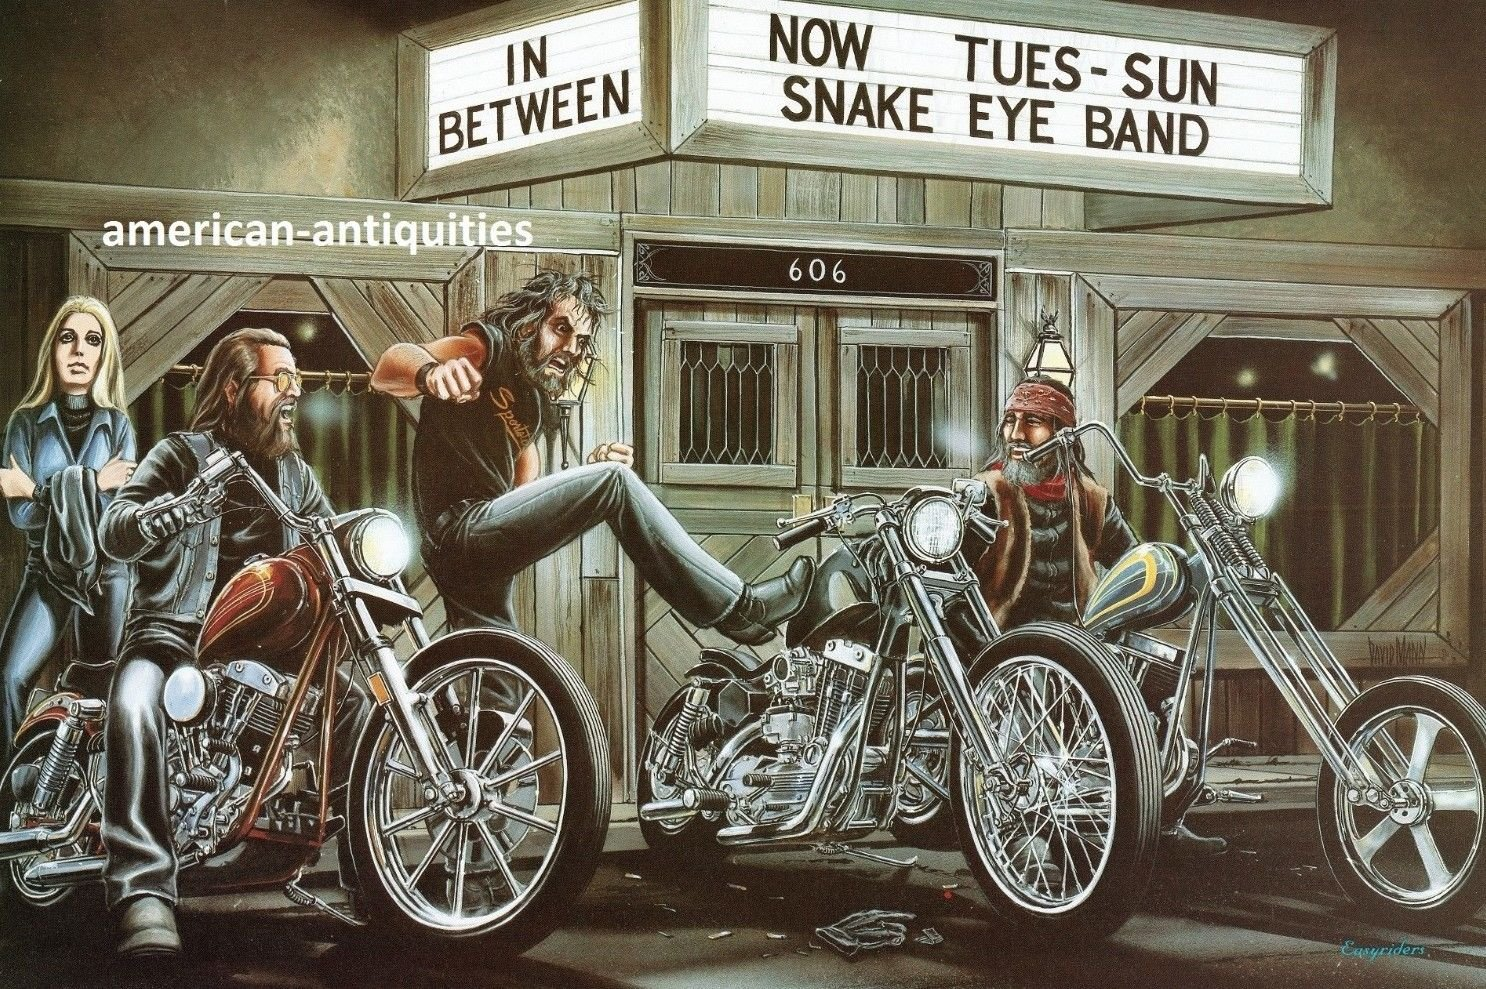 David Mann Motorcycle Art Wallpaper 1486x989